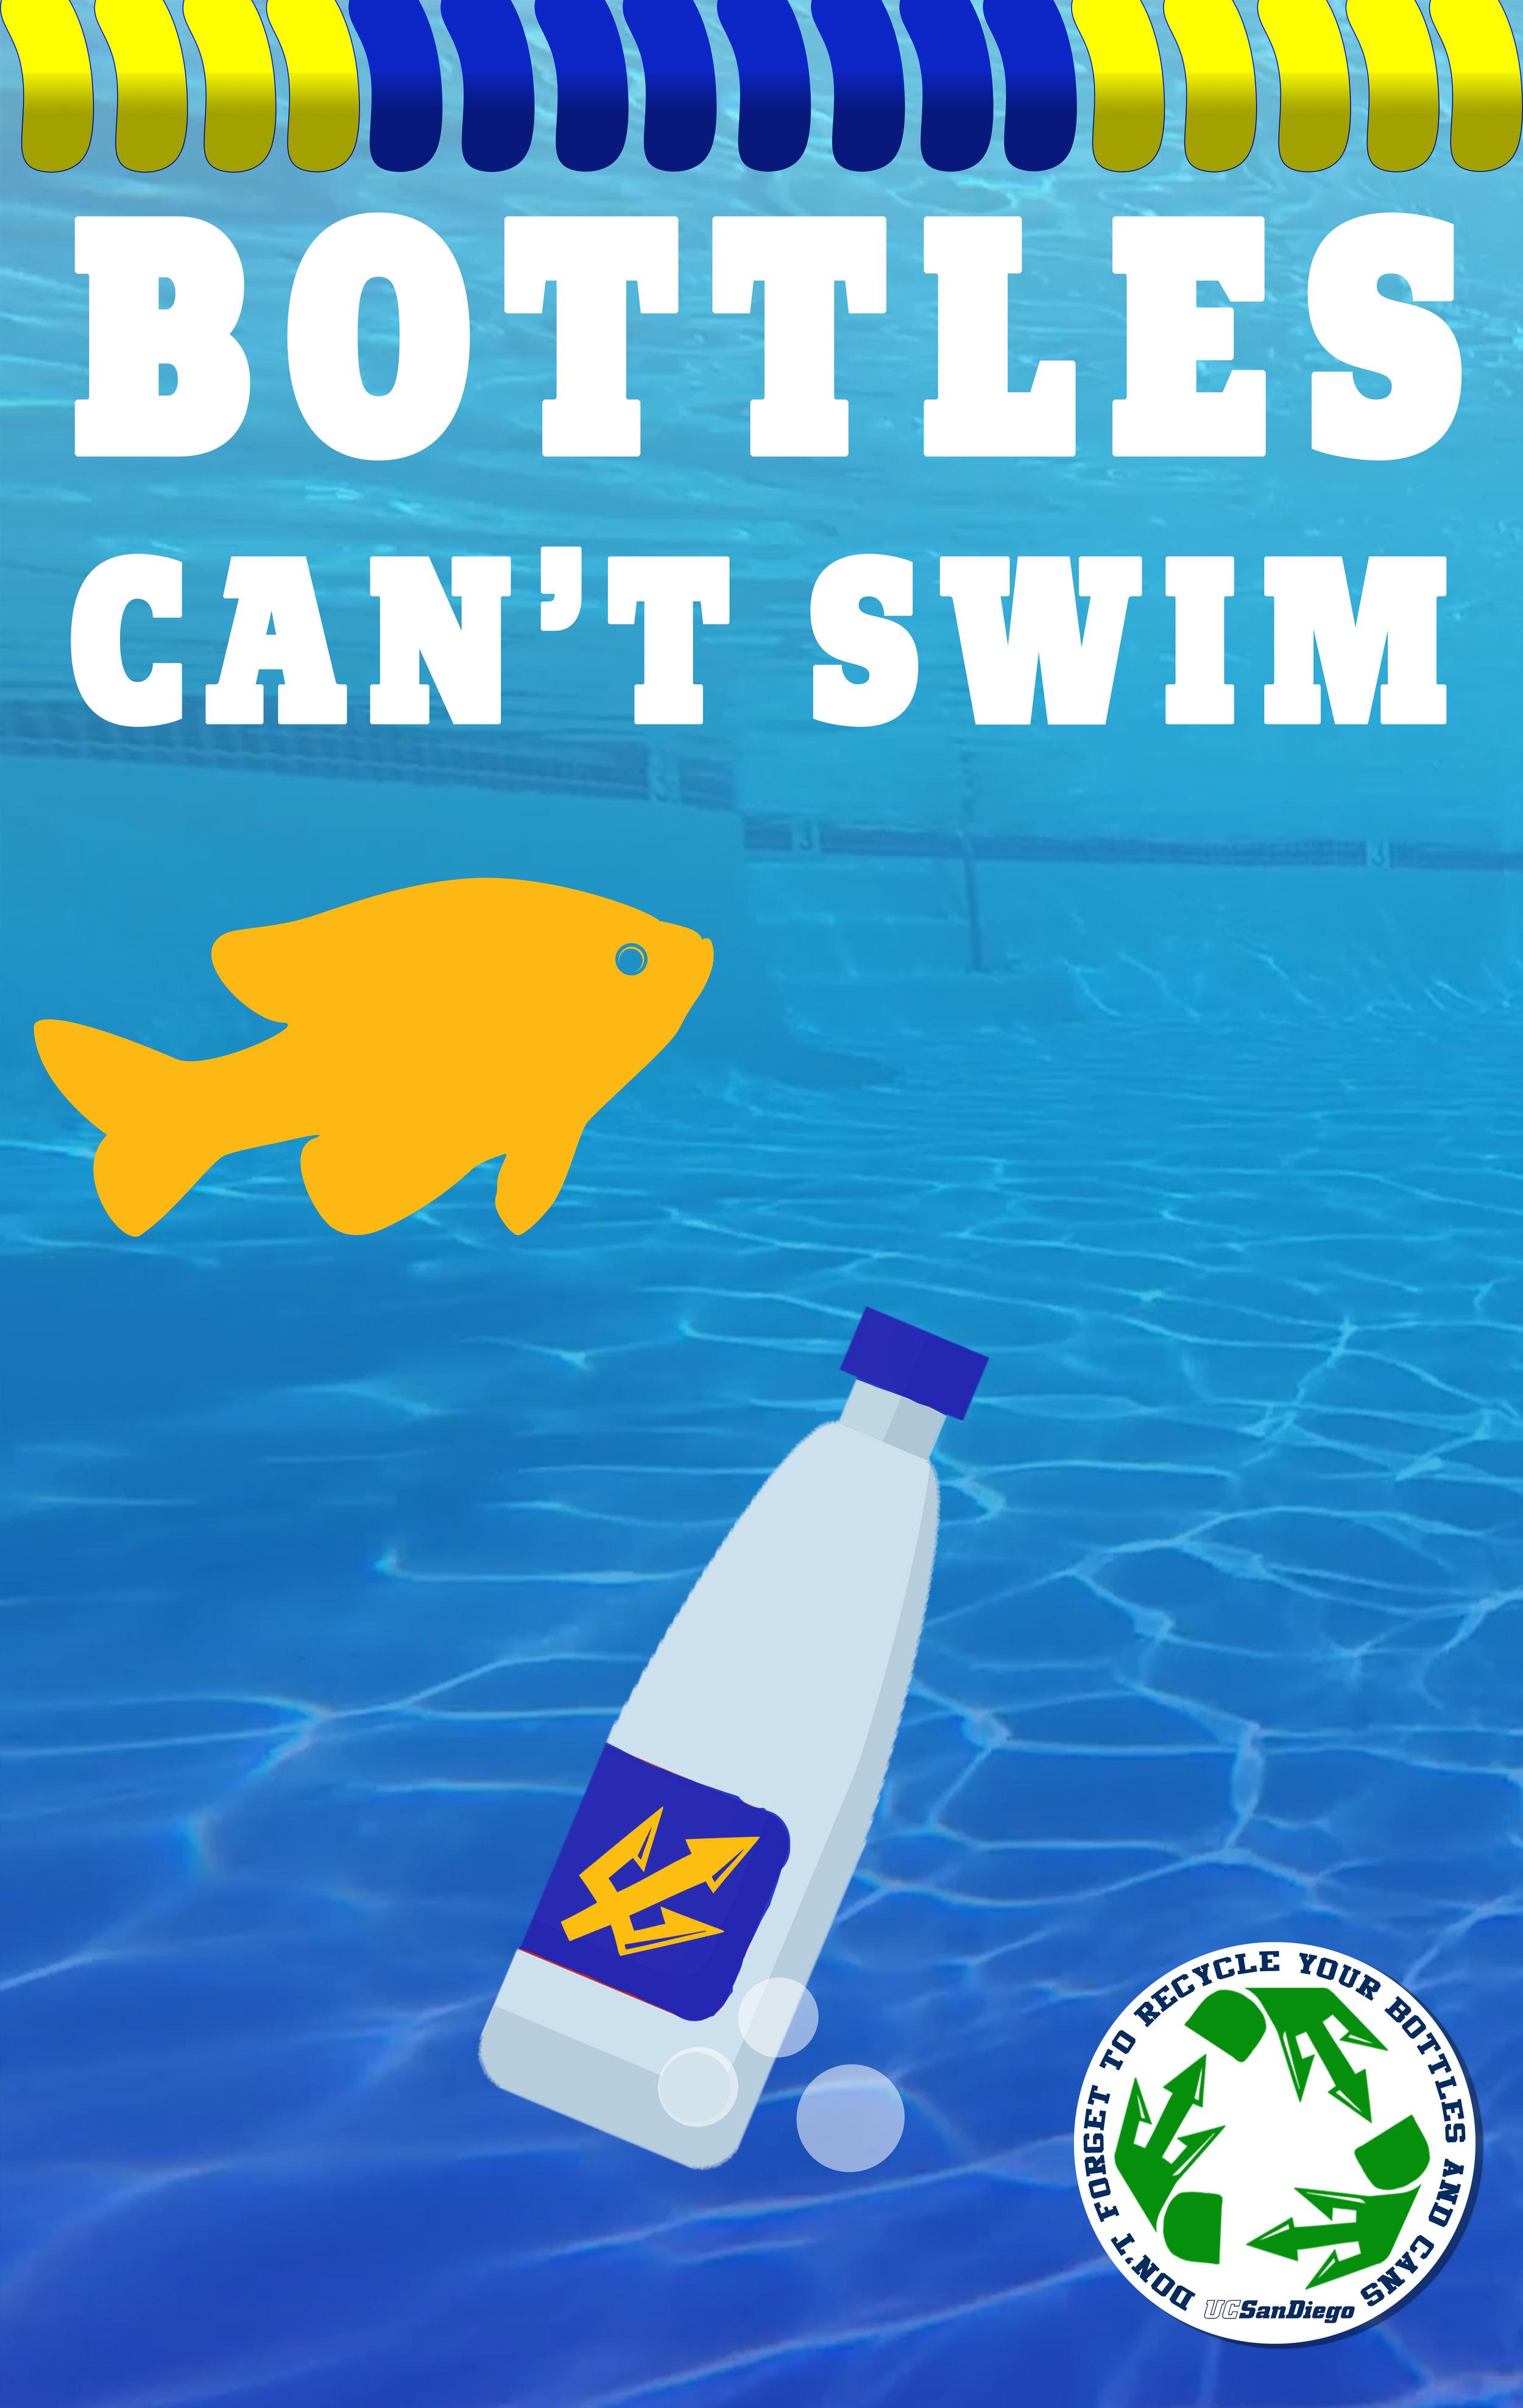 UCSD_Rec_Bins_Pool_Recycle.jpg